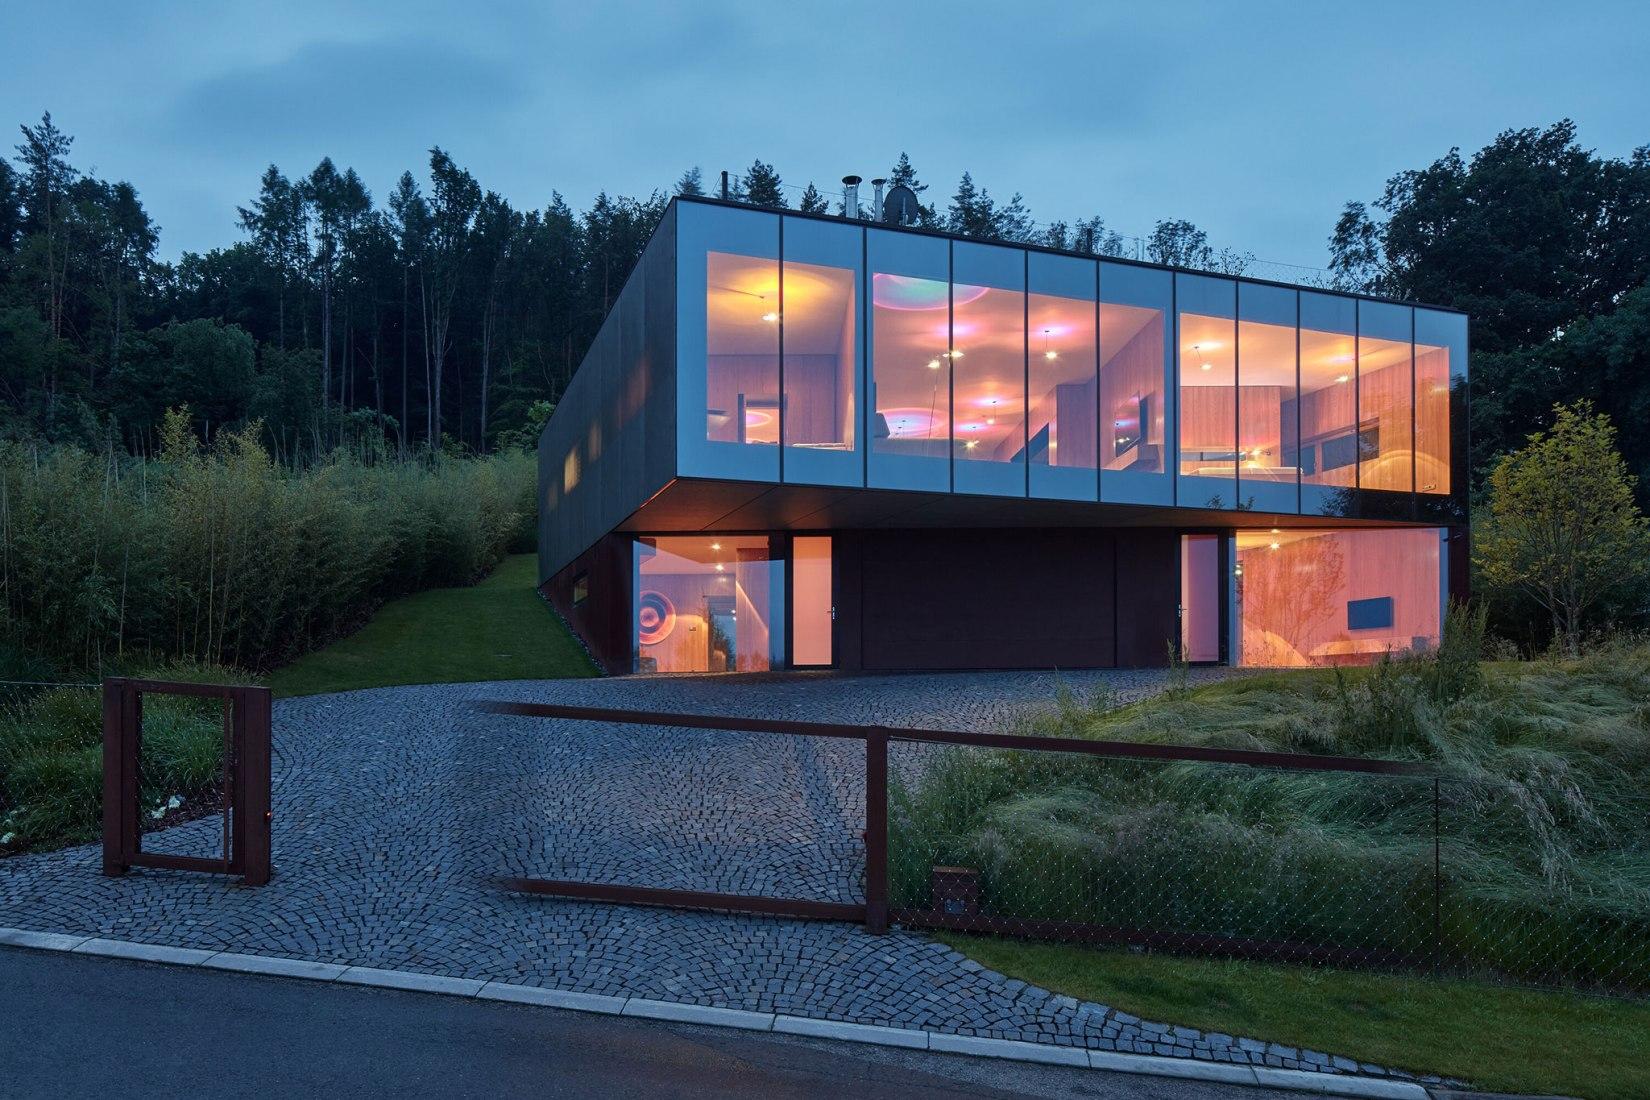 Lazy House by petrjanda/brainwork. Photograph by BoysPlayNice